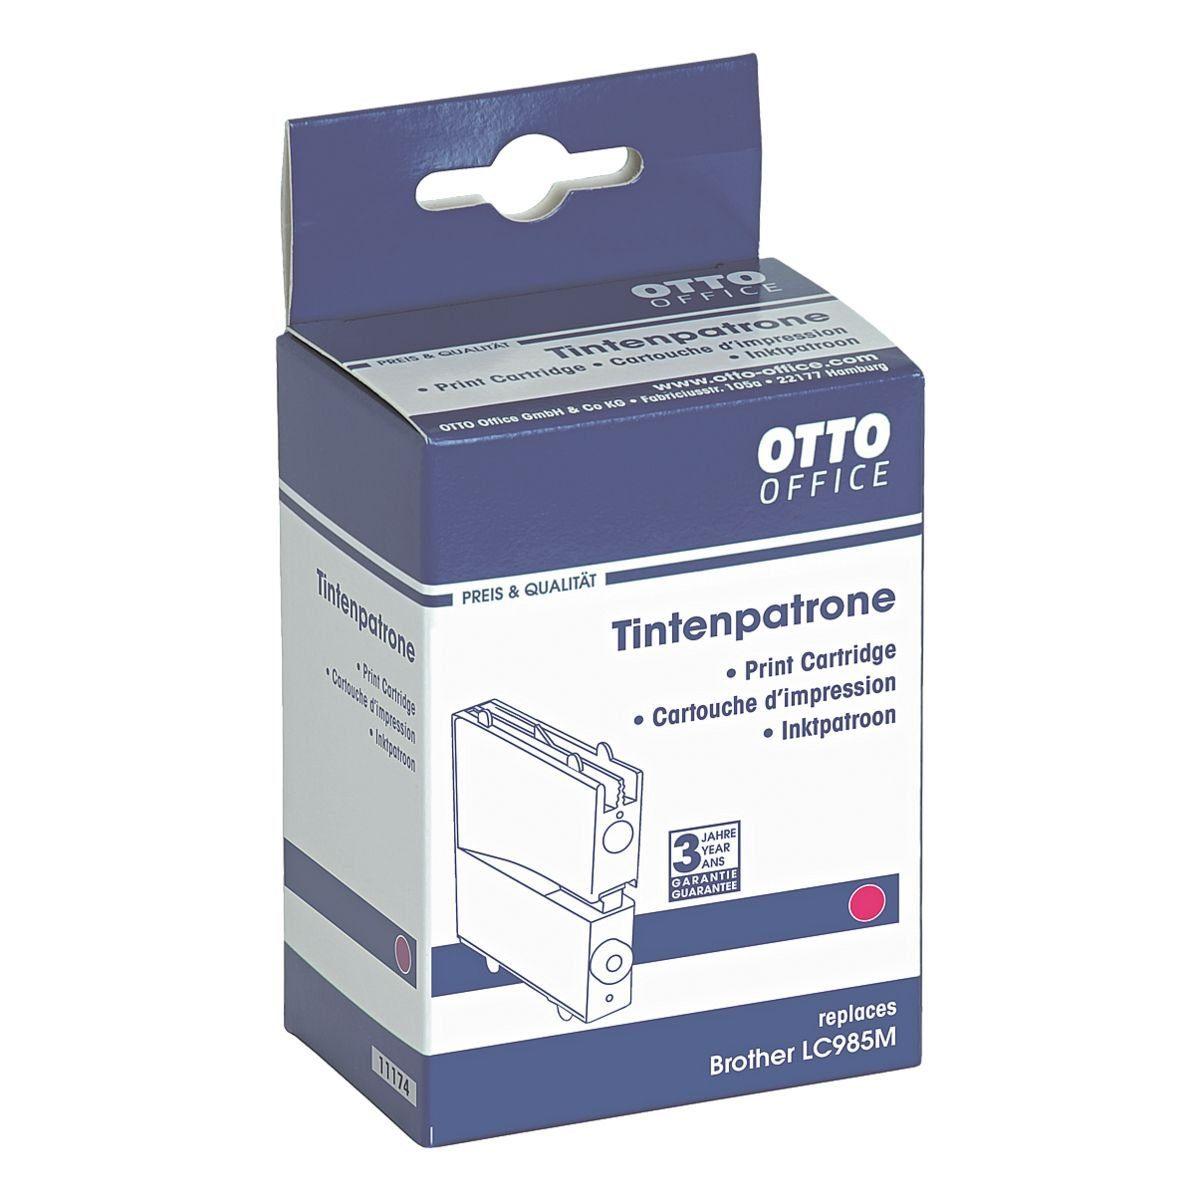 OTTO Office Standard Tintenpatrone ersetzt Brother »LC985M«